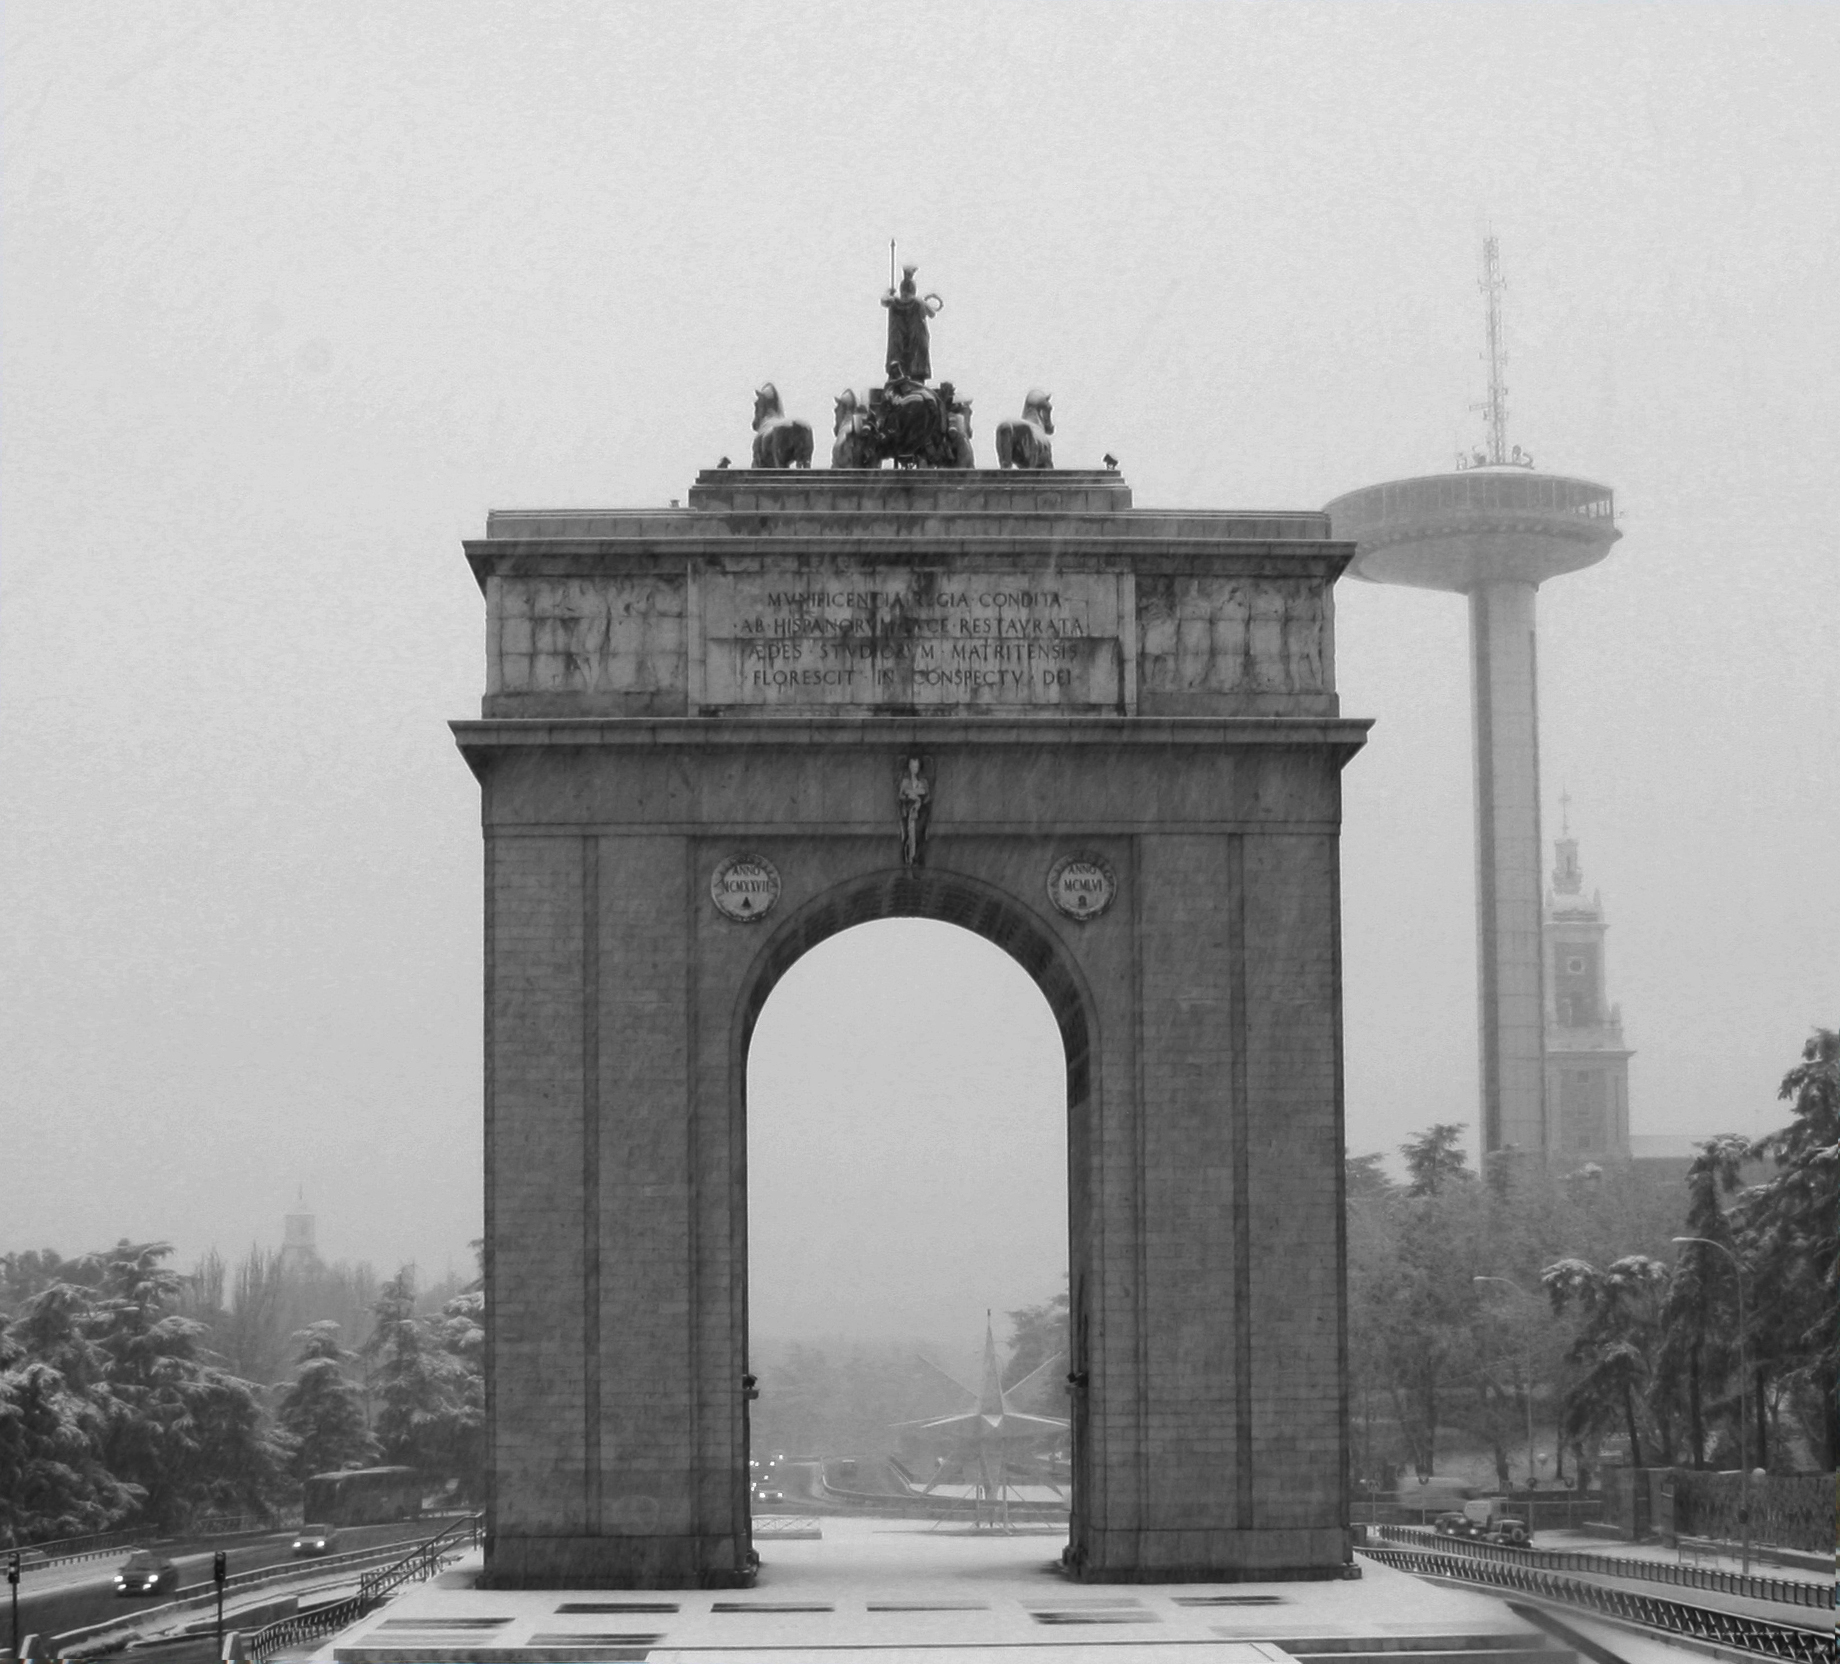 Puerta de moncloa and the moncloa tower in the snow for Puerta la victoria